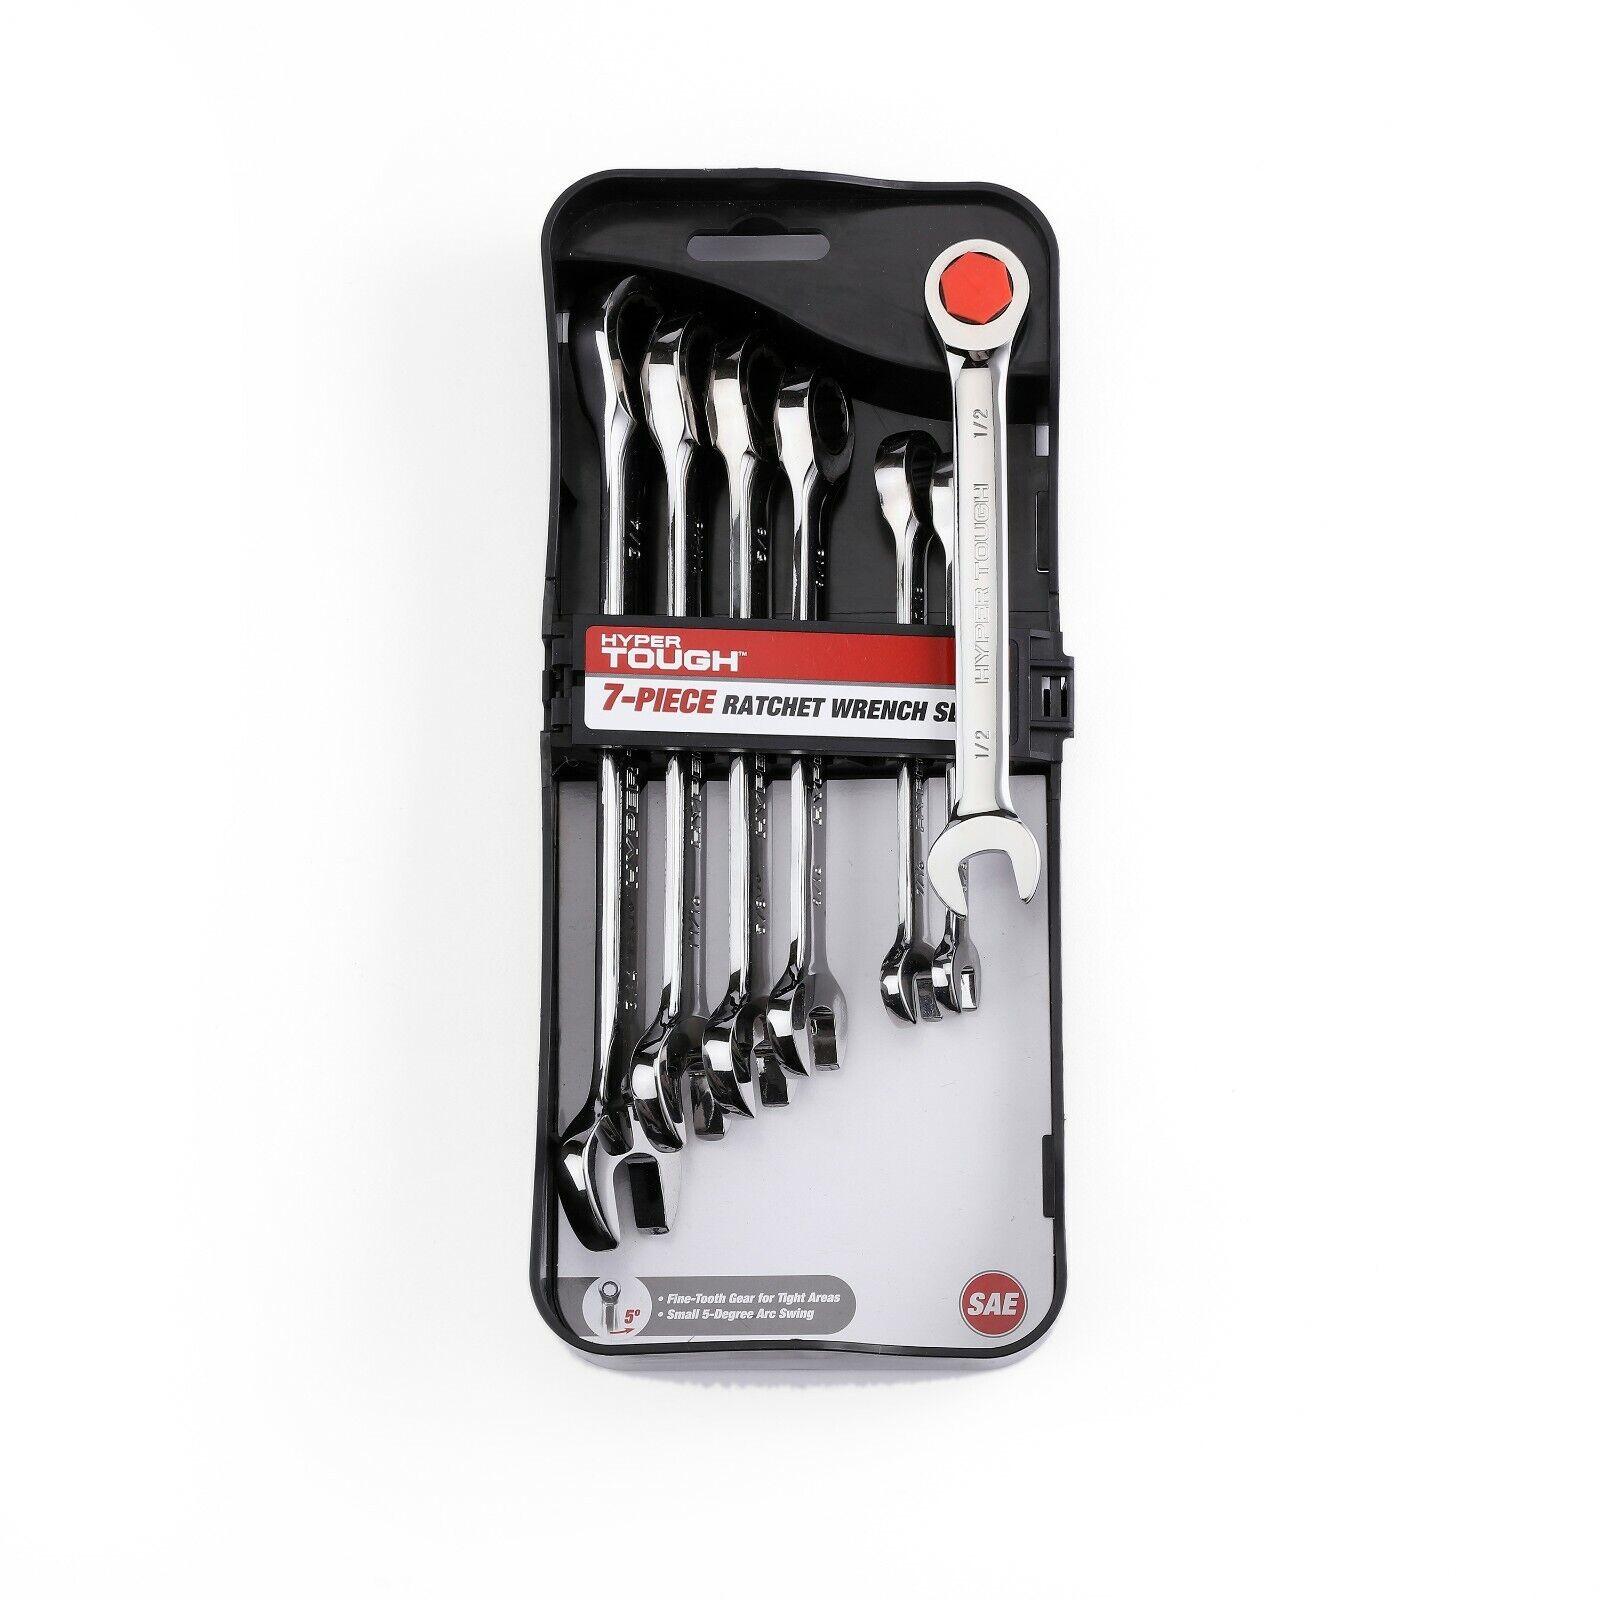 Mechanic Tools 7-Piece Metric Chrome Vanadium Ratcheting Ratchet Wrench Set